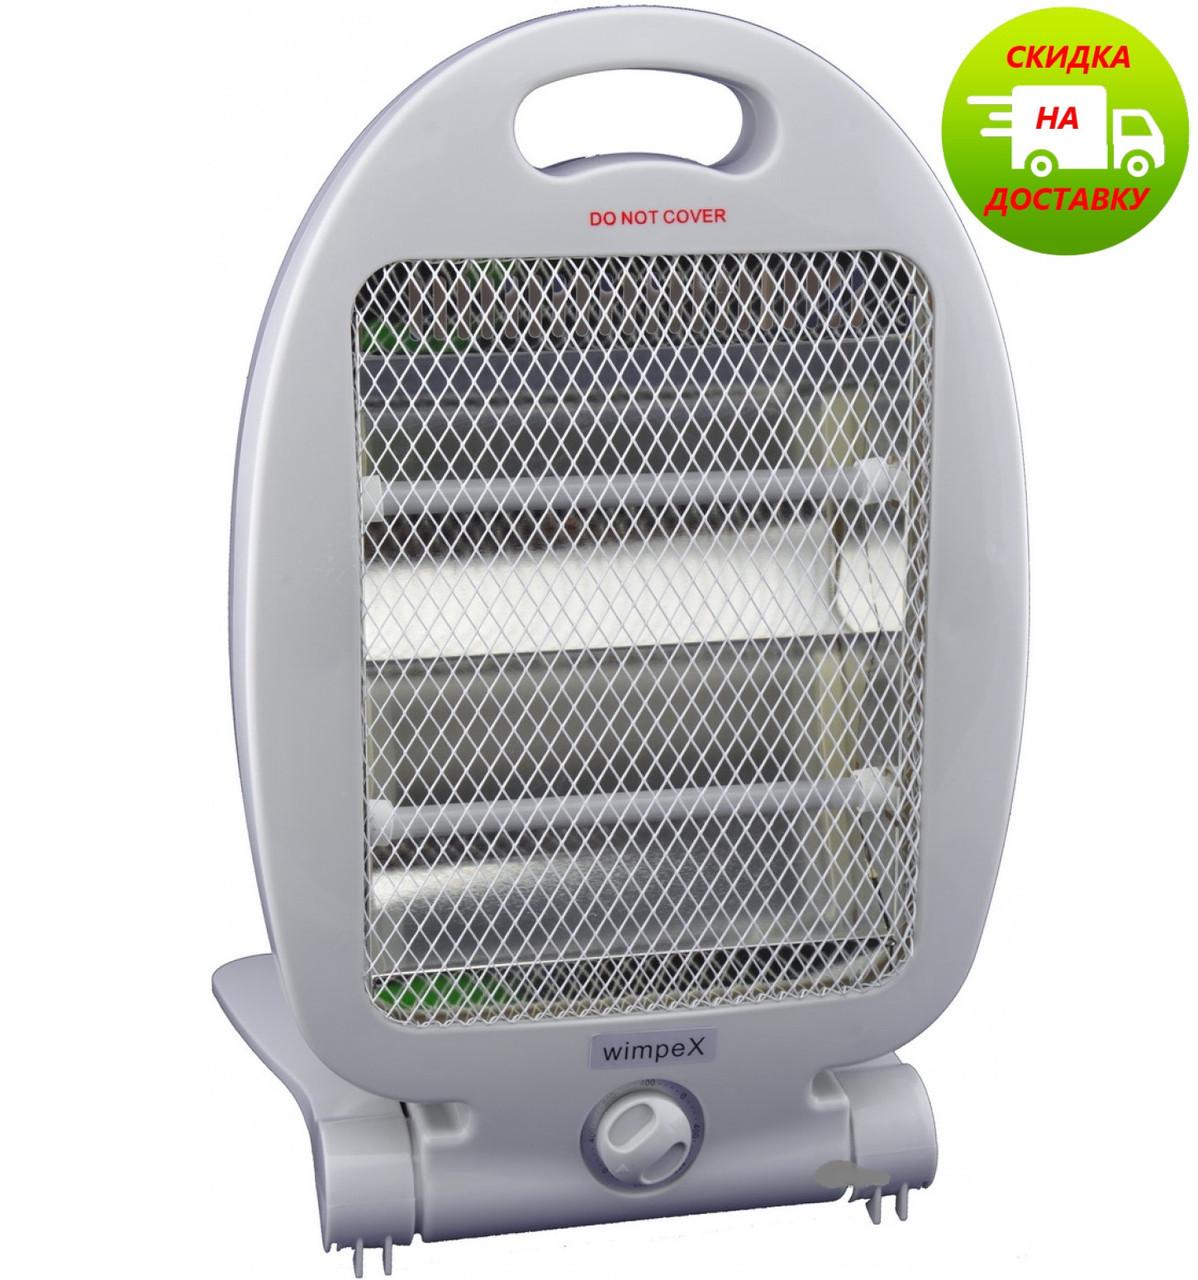 Бытовой электро обогреватель | Камин | Обігрівач | WimpeX WX 454 (400 - 800 Вт)